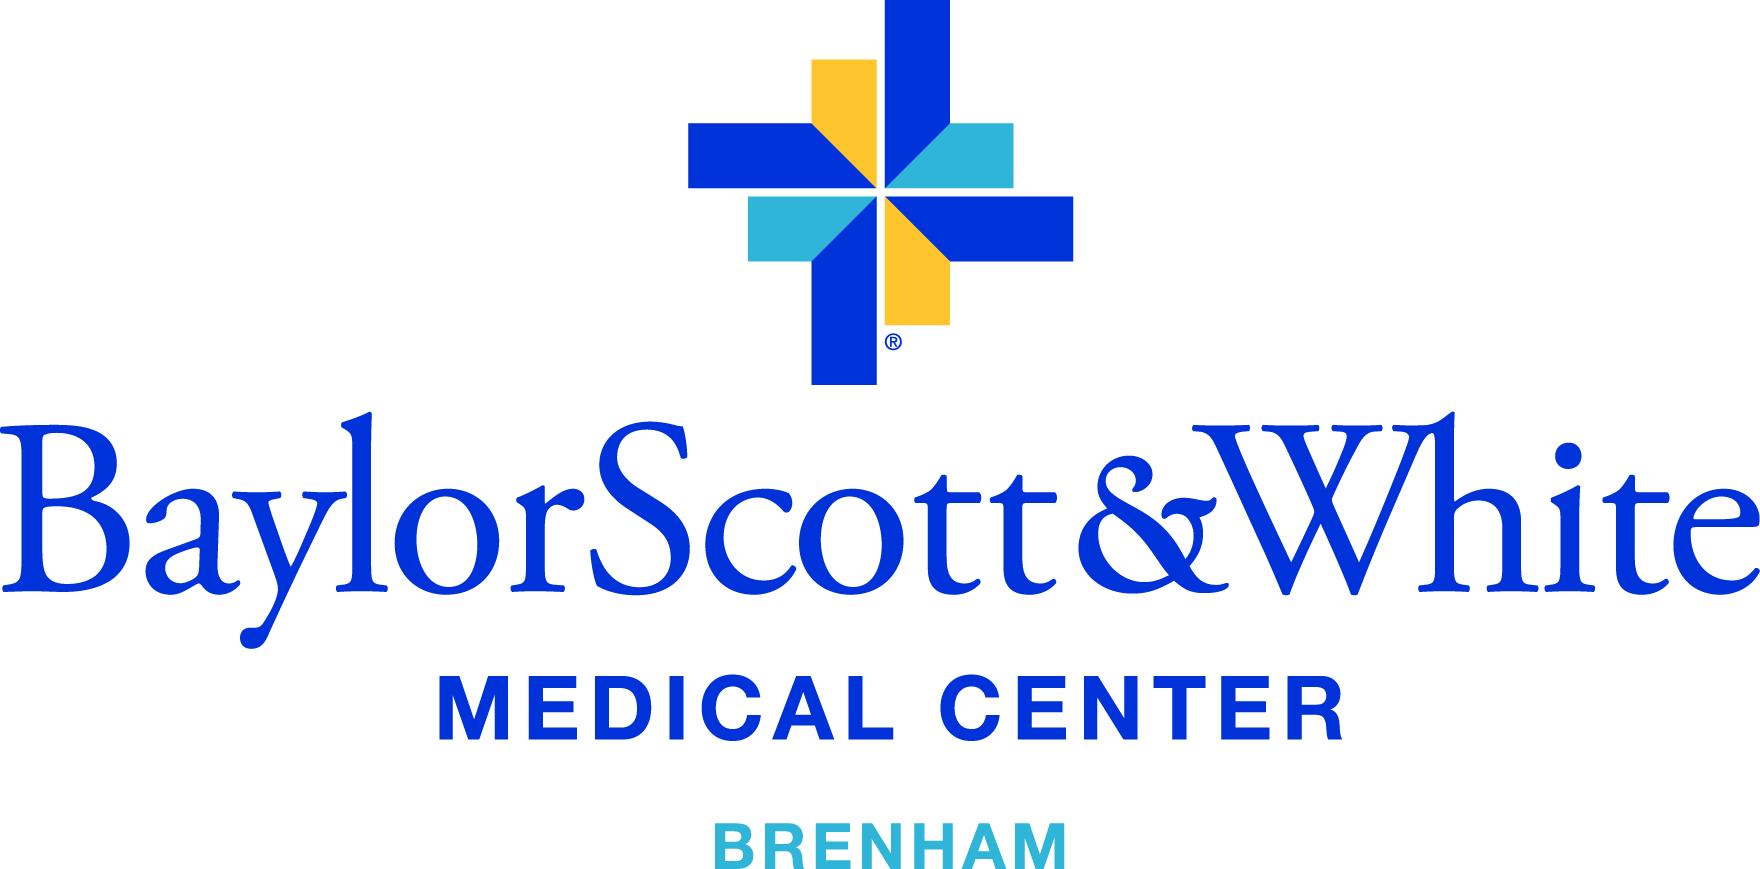 Baylore_S&W_Medical_Center_Brenham_GOOD